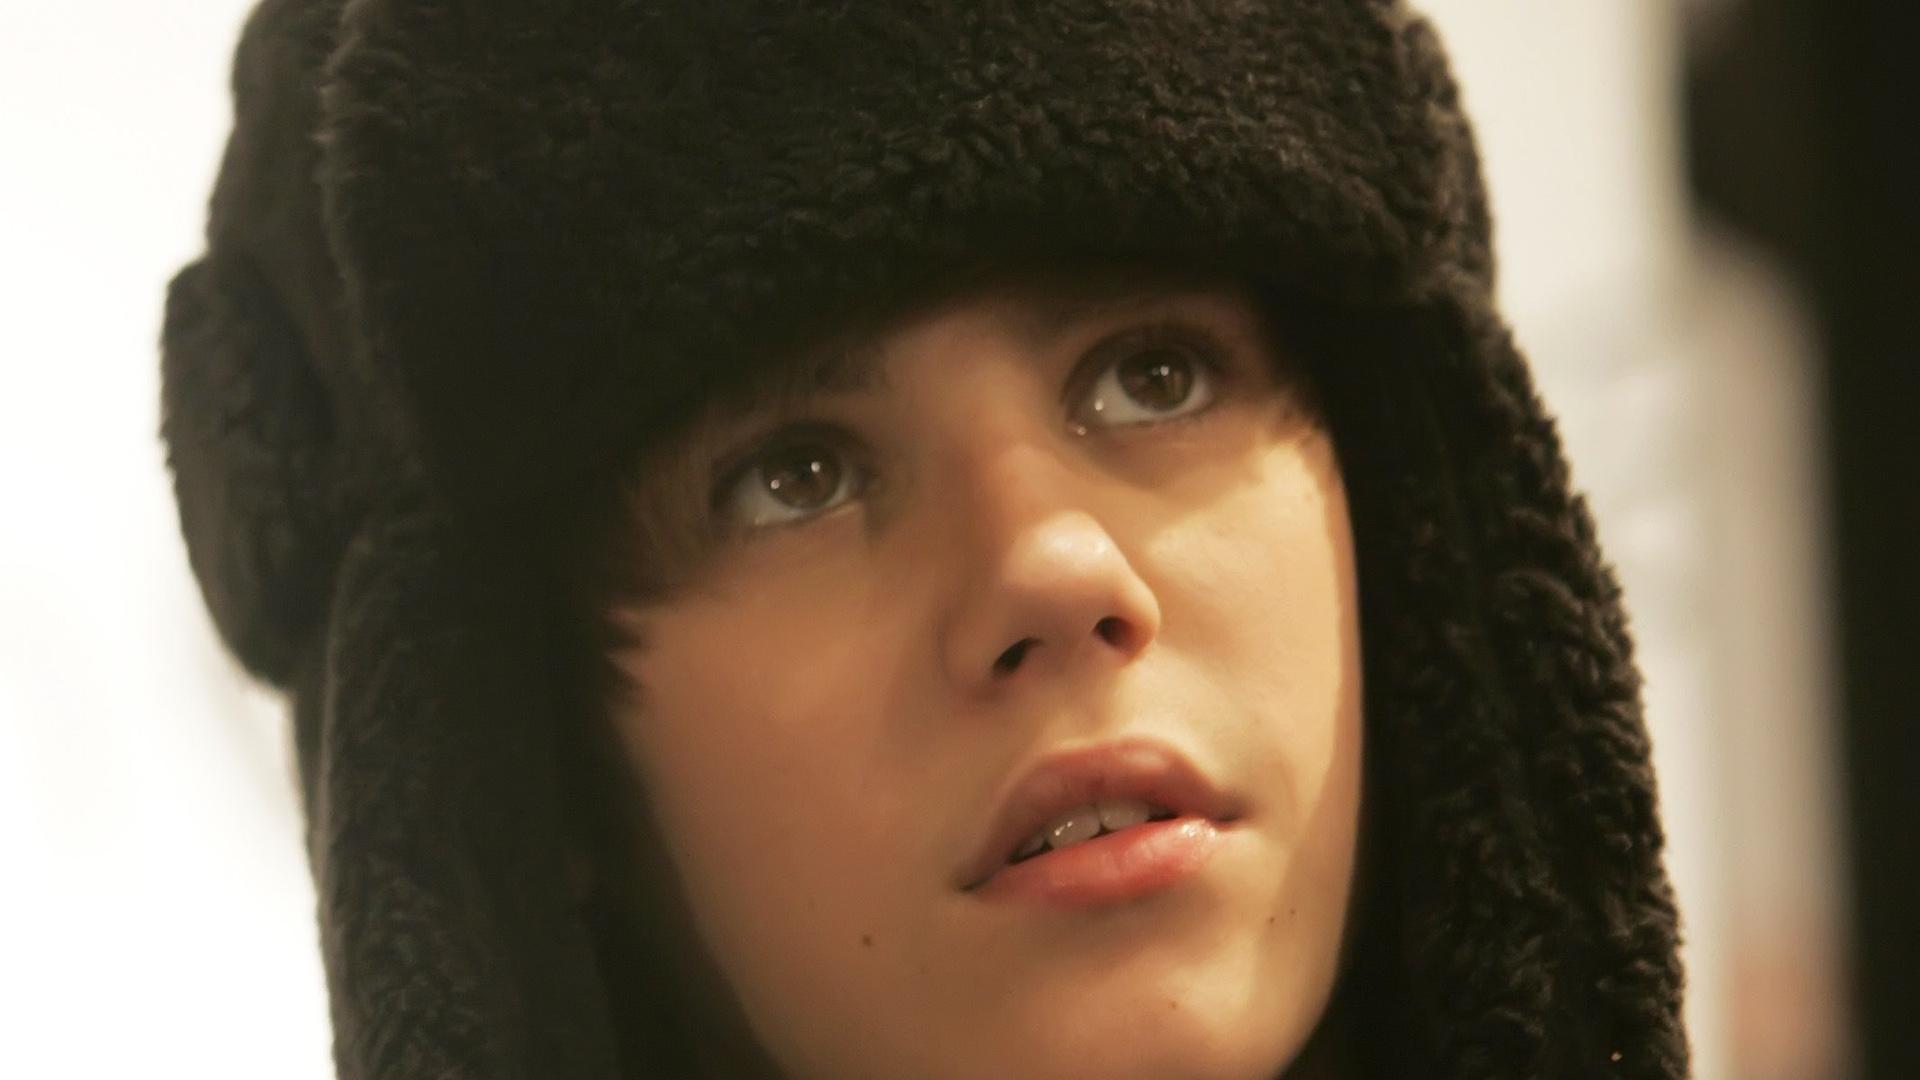 Download Wallpaper 1920x1080 Justin Bieber Hat Face Look Full Hd